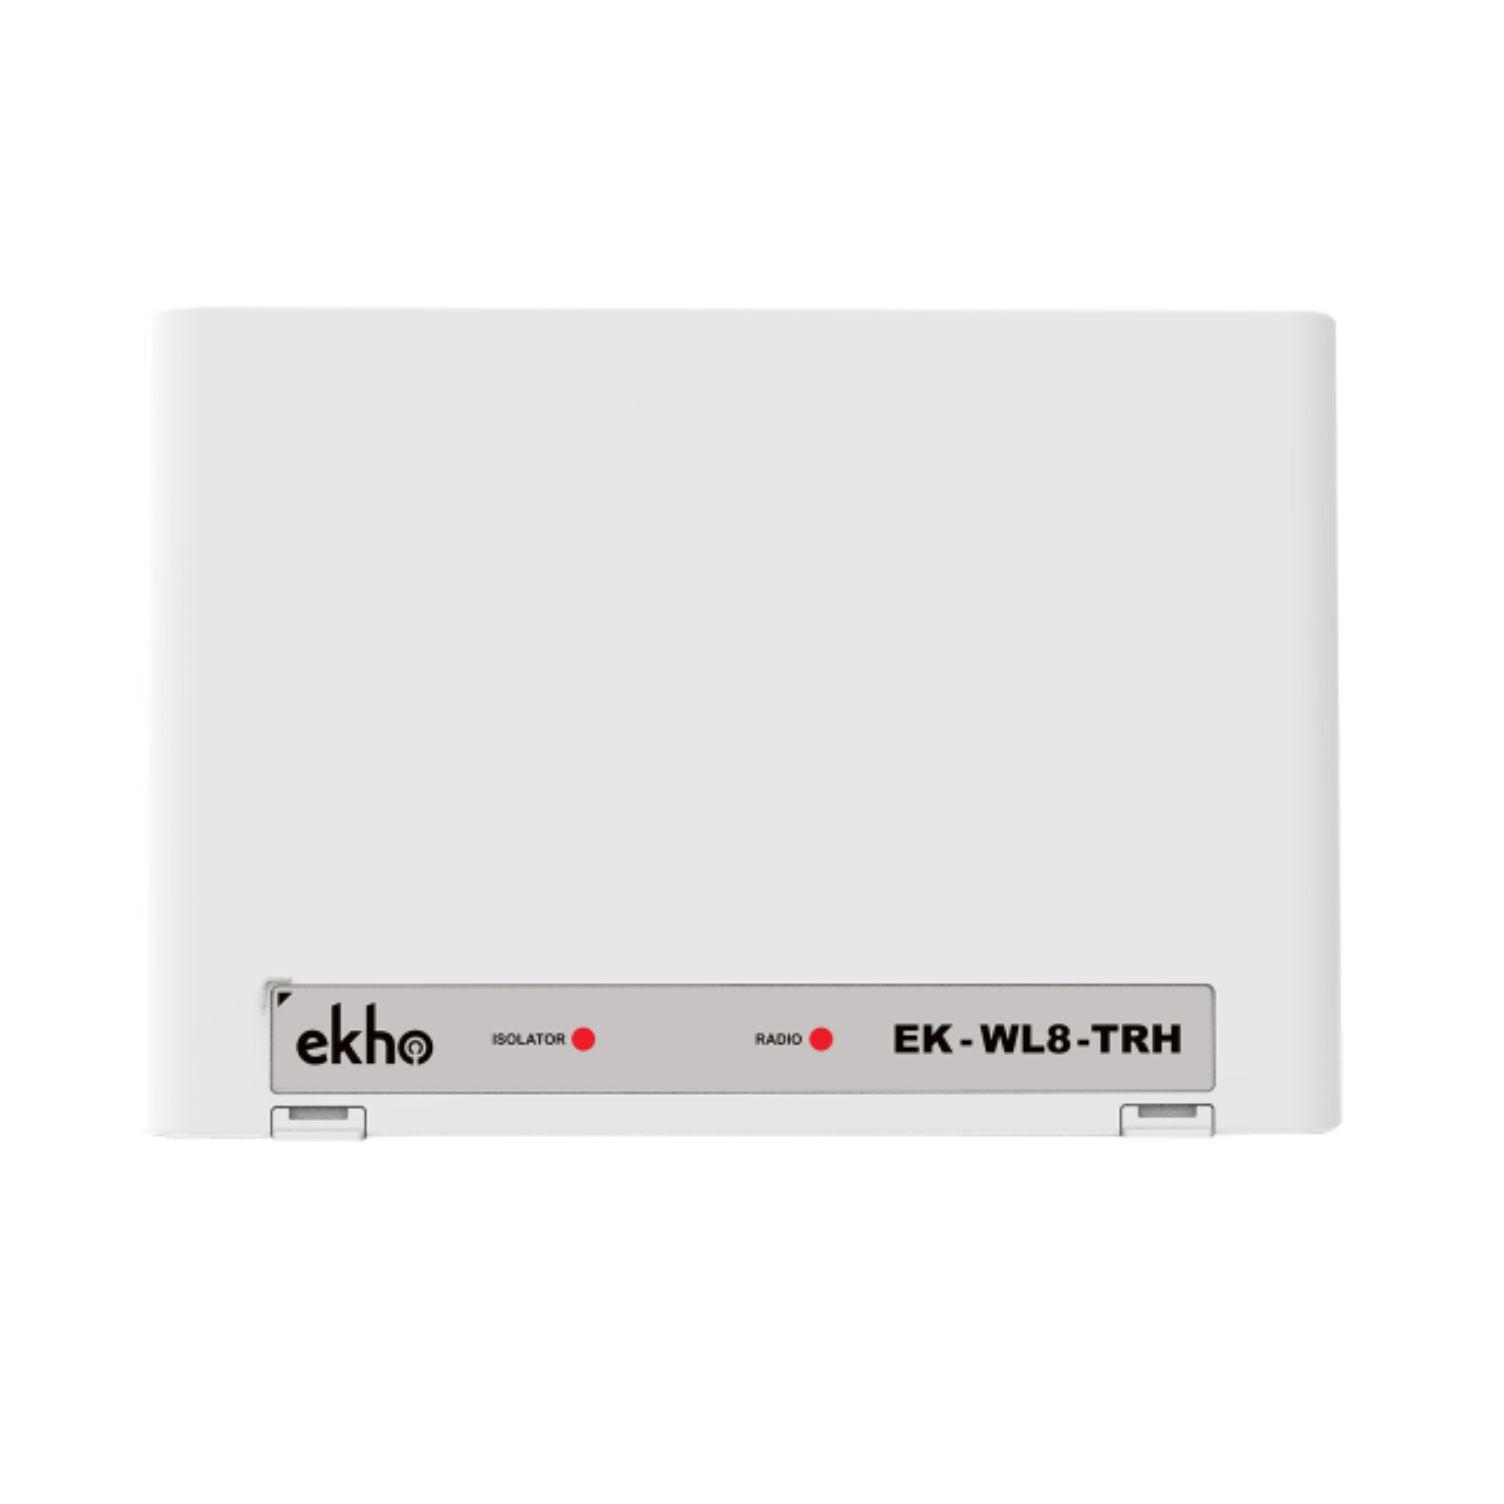 EKHO Hybrid Wireless Translator Module